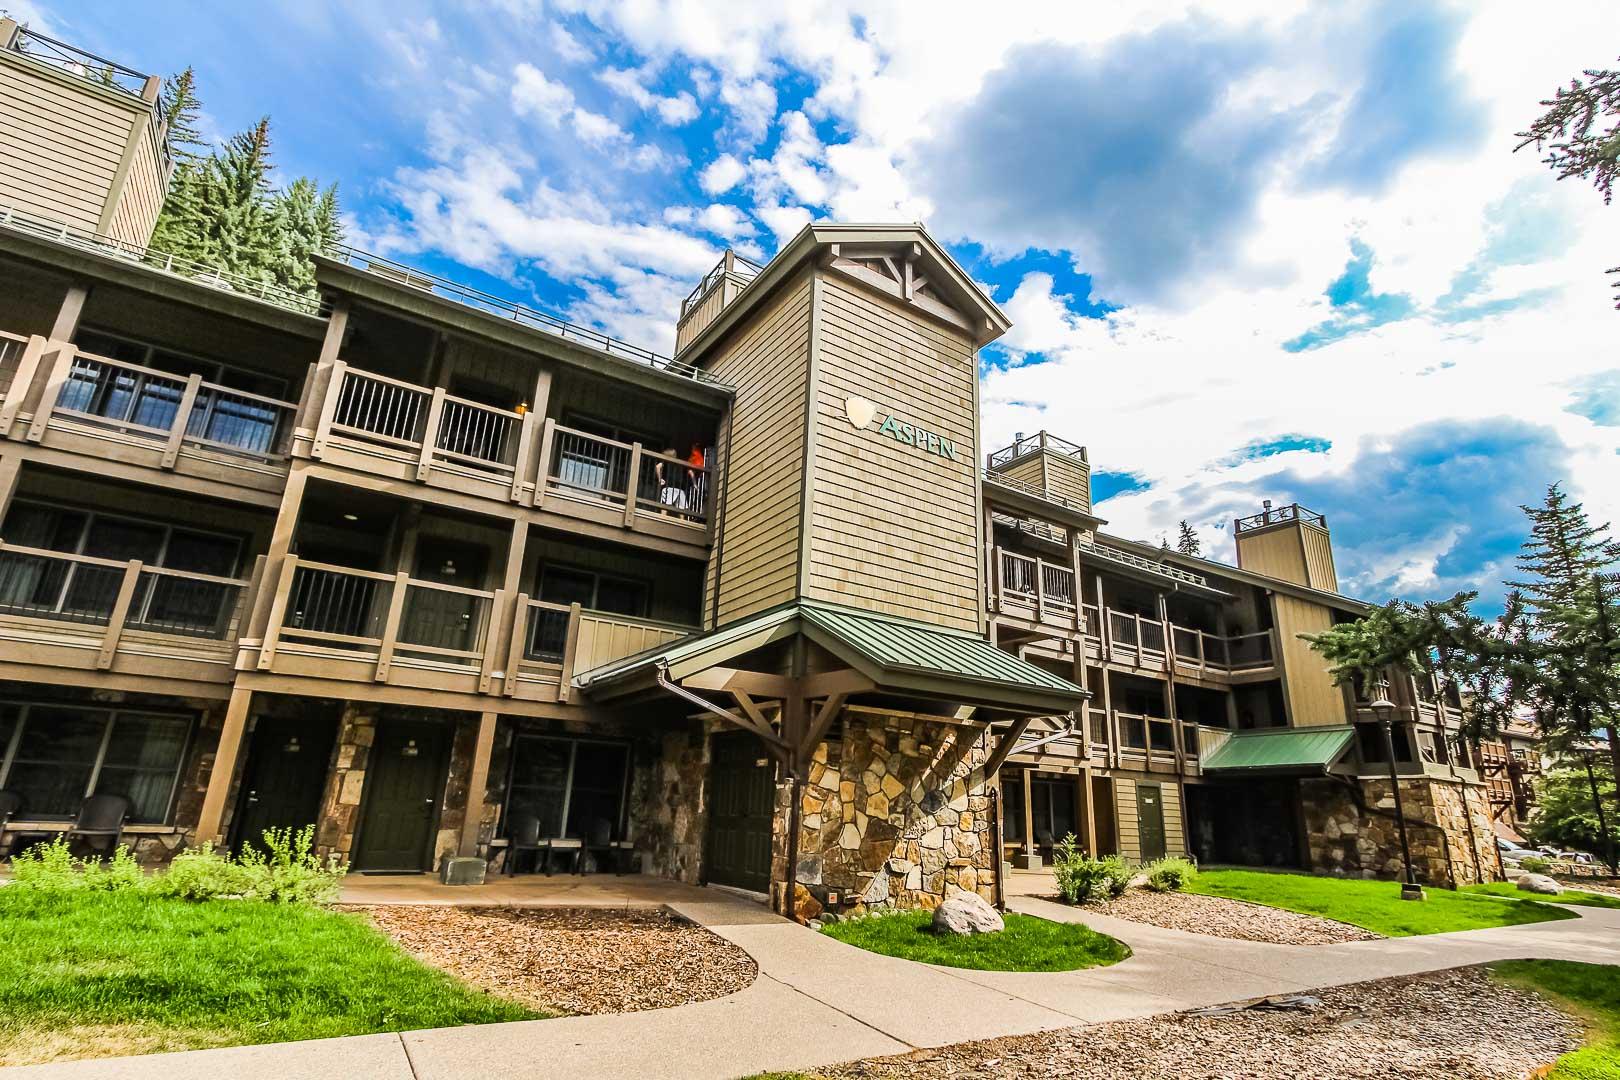 A stoic resort building at VRI's Aspen at Streamside in Colorado.